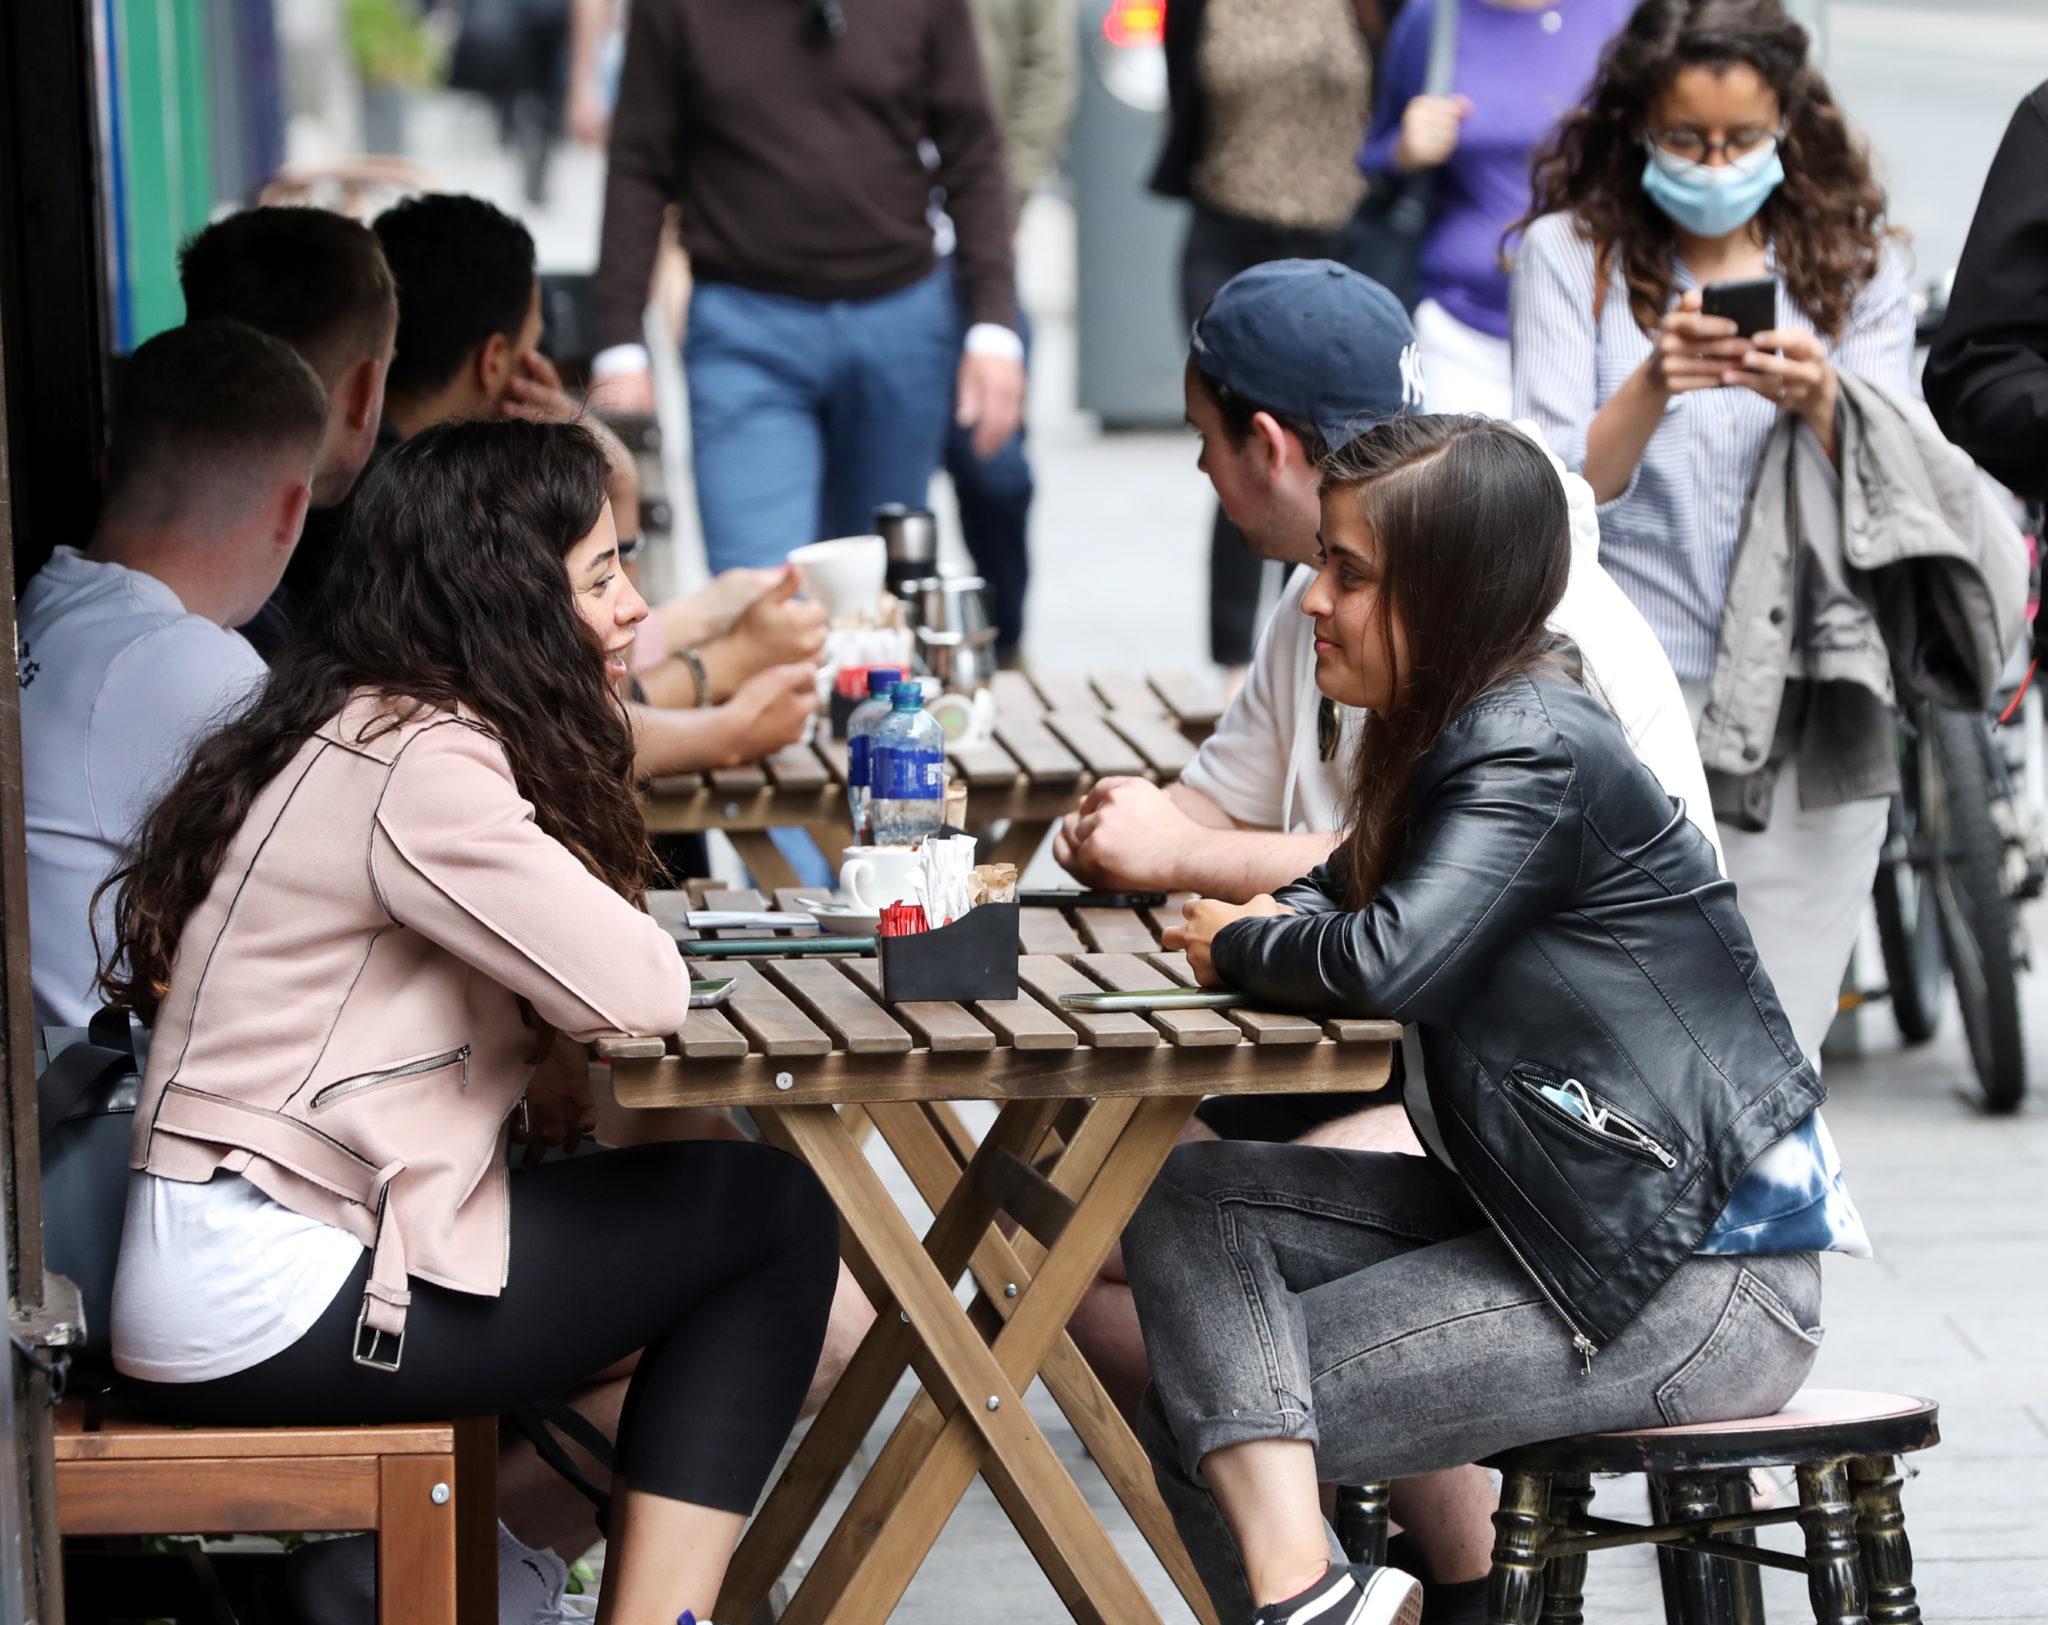 People enjoying coffee outside a restaurant in Dublin City Centre, 07-06-2021. Image: Sasko Lazarov/RollingNews